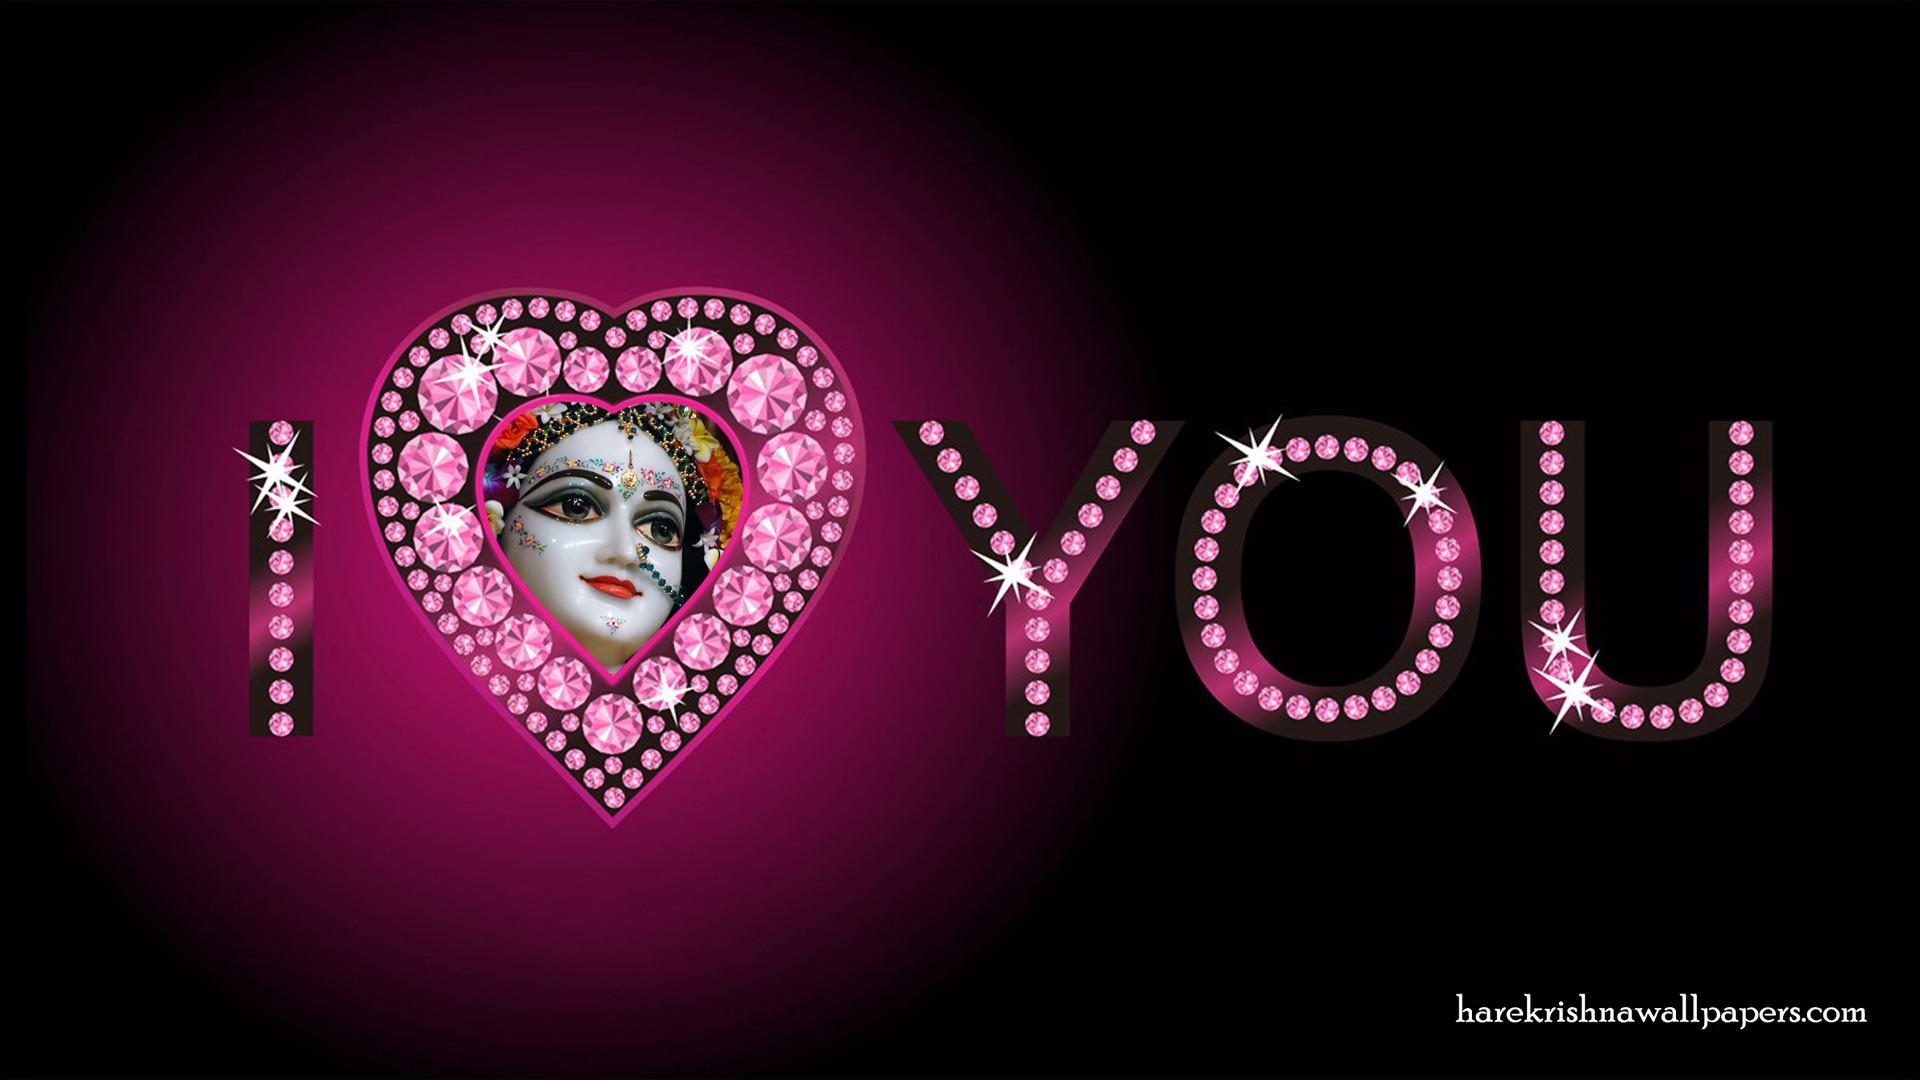 I Love You Radharani Wallpaper (013) Size 1920x1080 Download